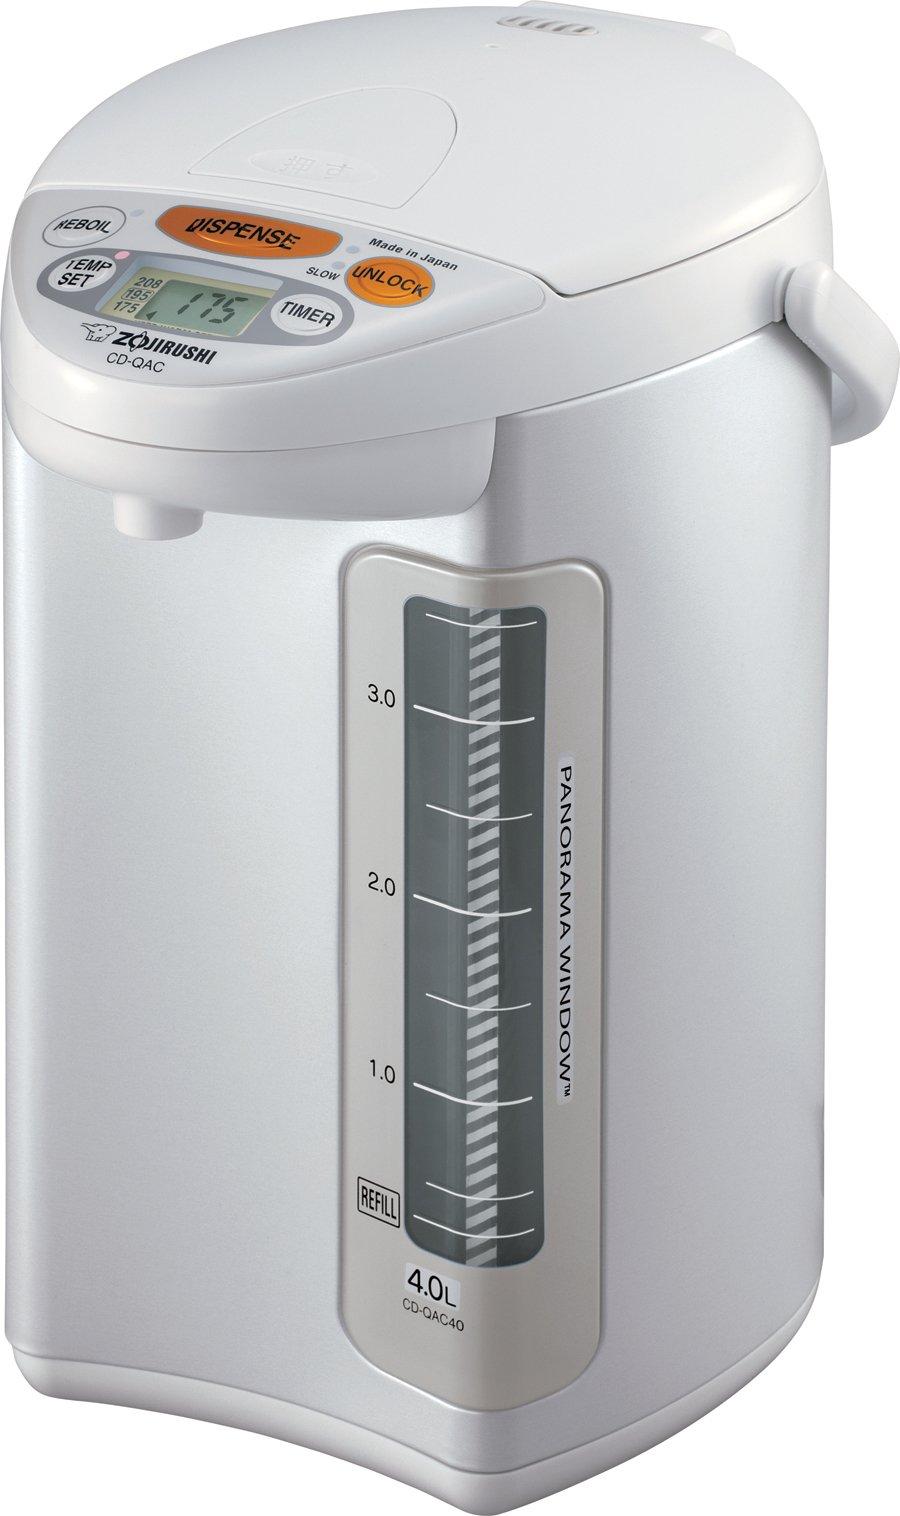 Zojirushi CD-QAC40 Micom Water Boiler and Warmer, Pearl White